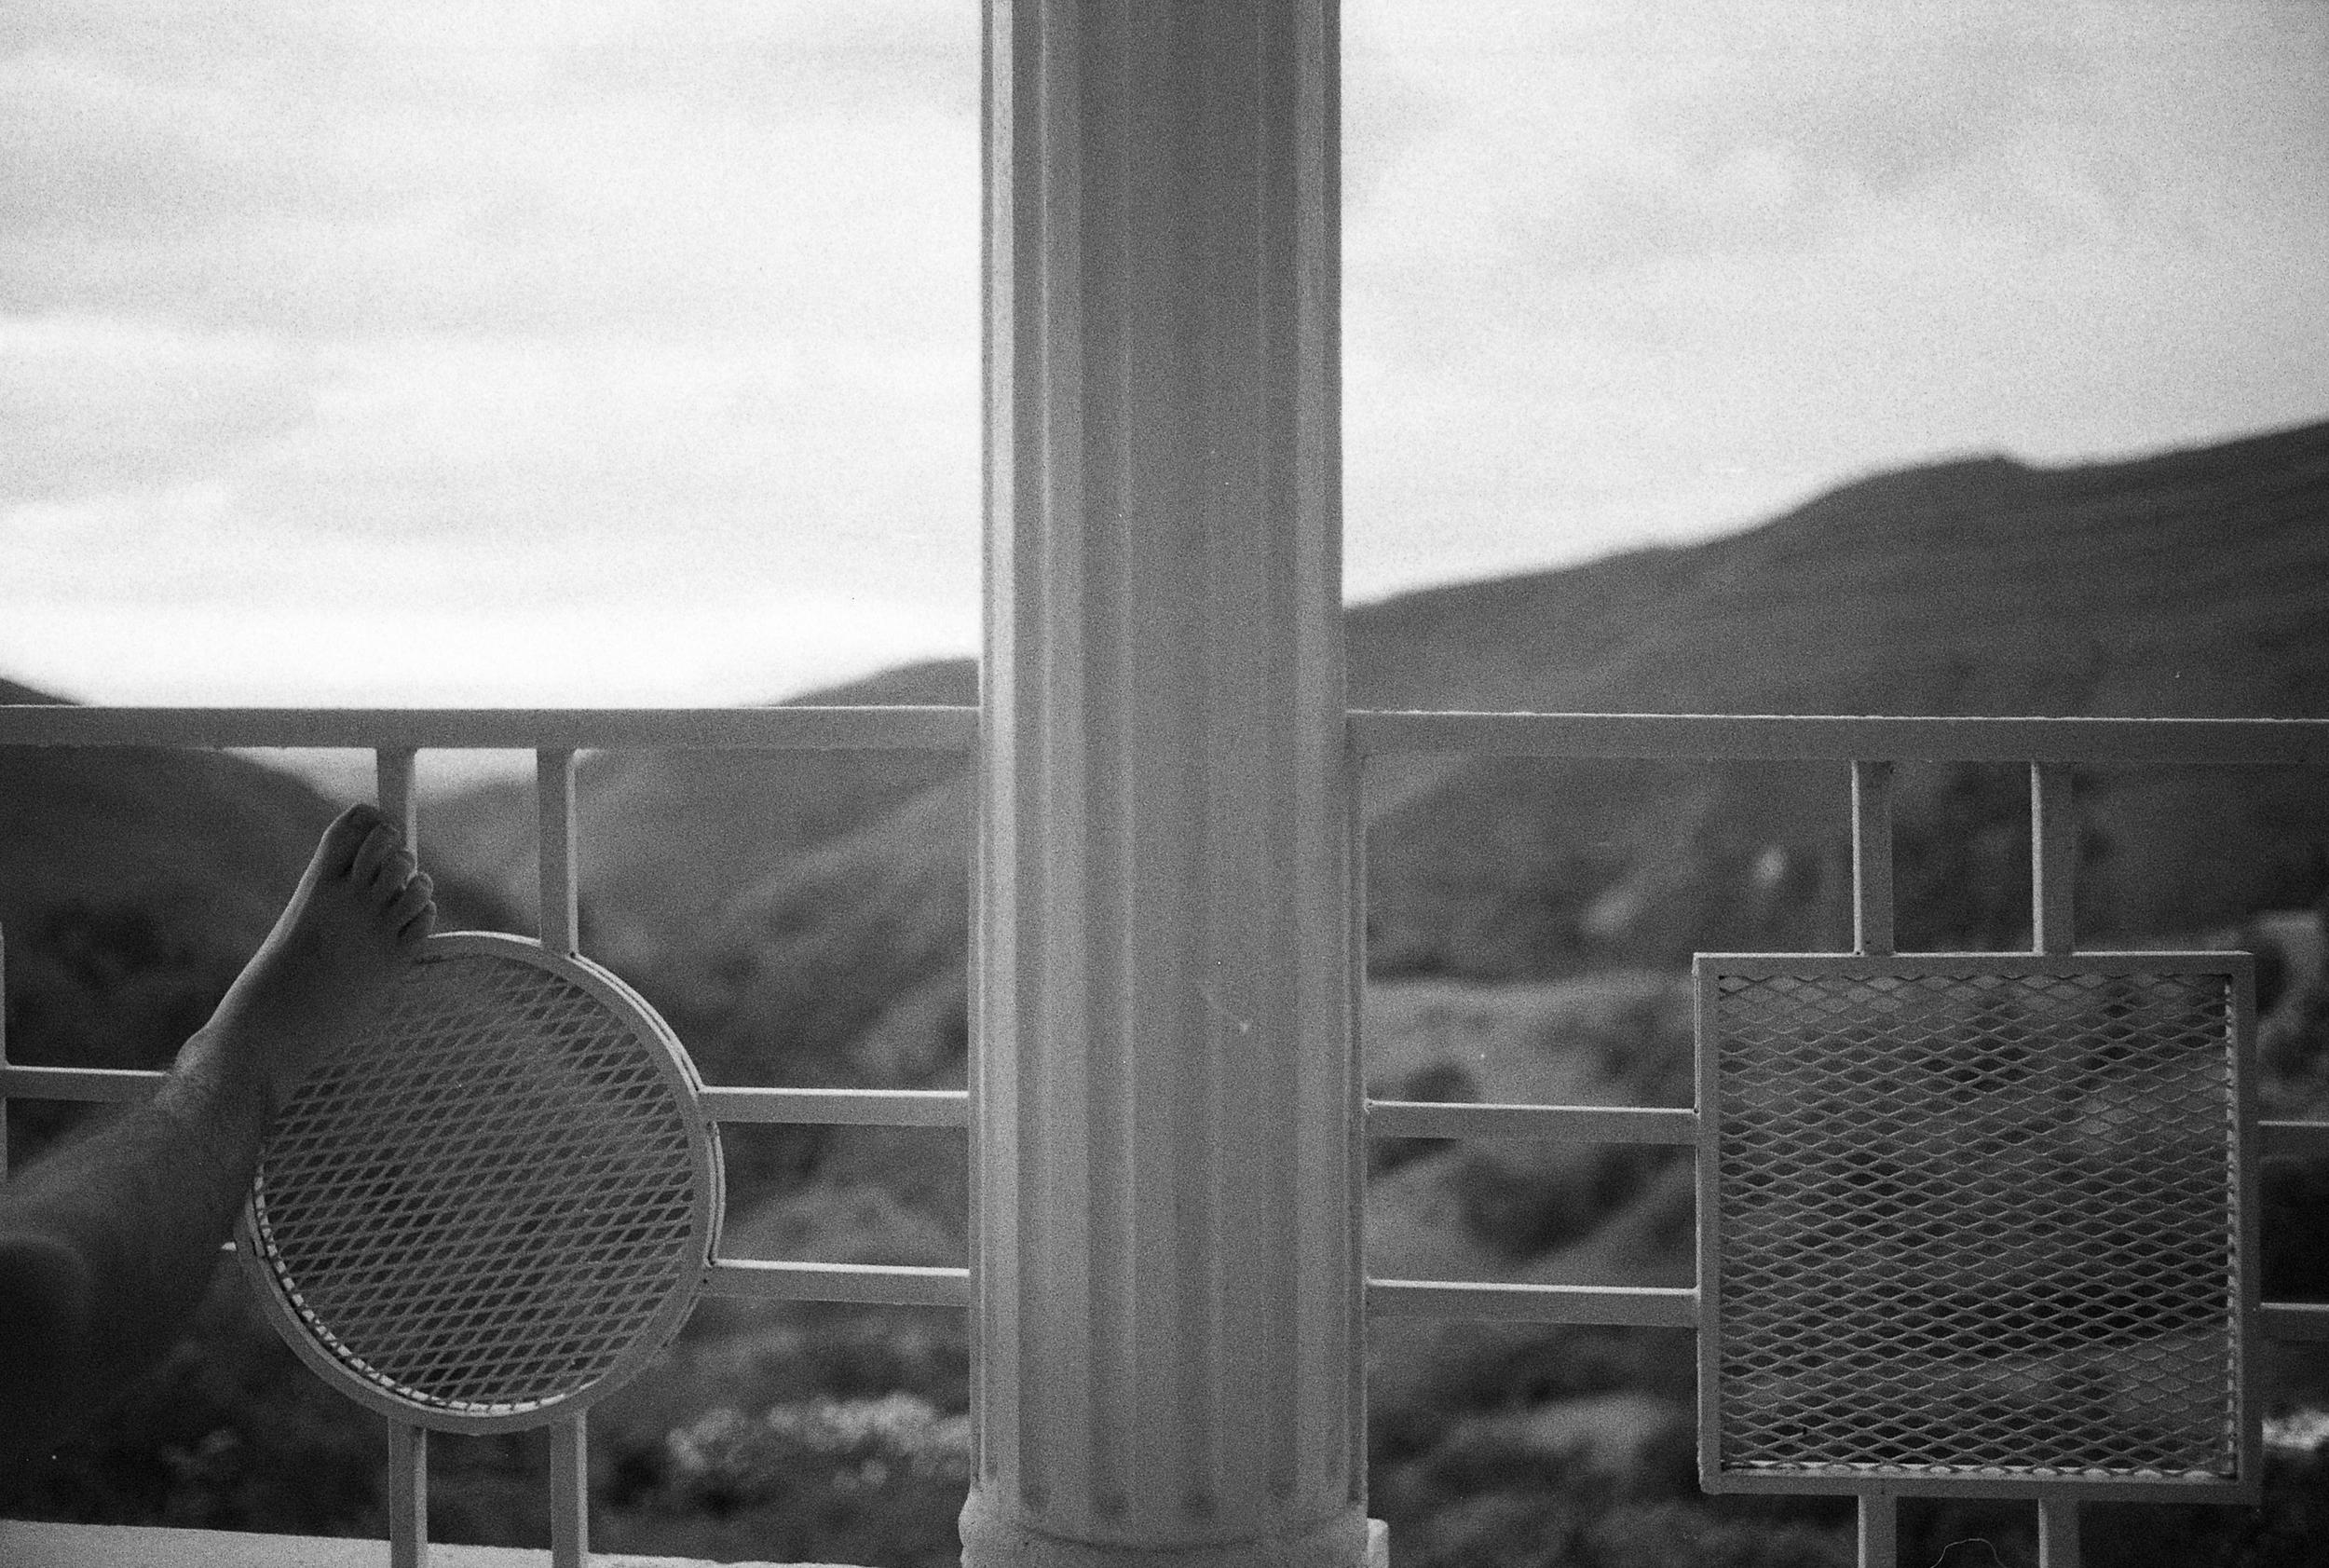 The Balcony Above.   Zanmi Lasante. Cange, Haiti. 2009  35 mm B&W film